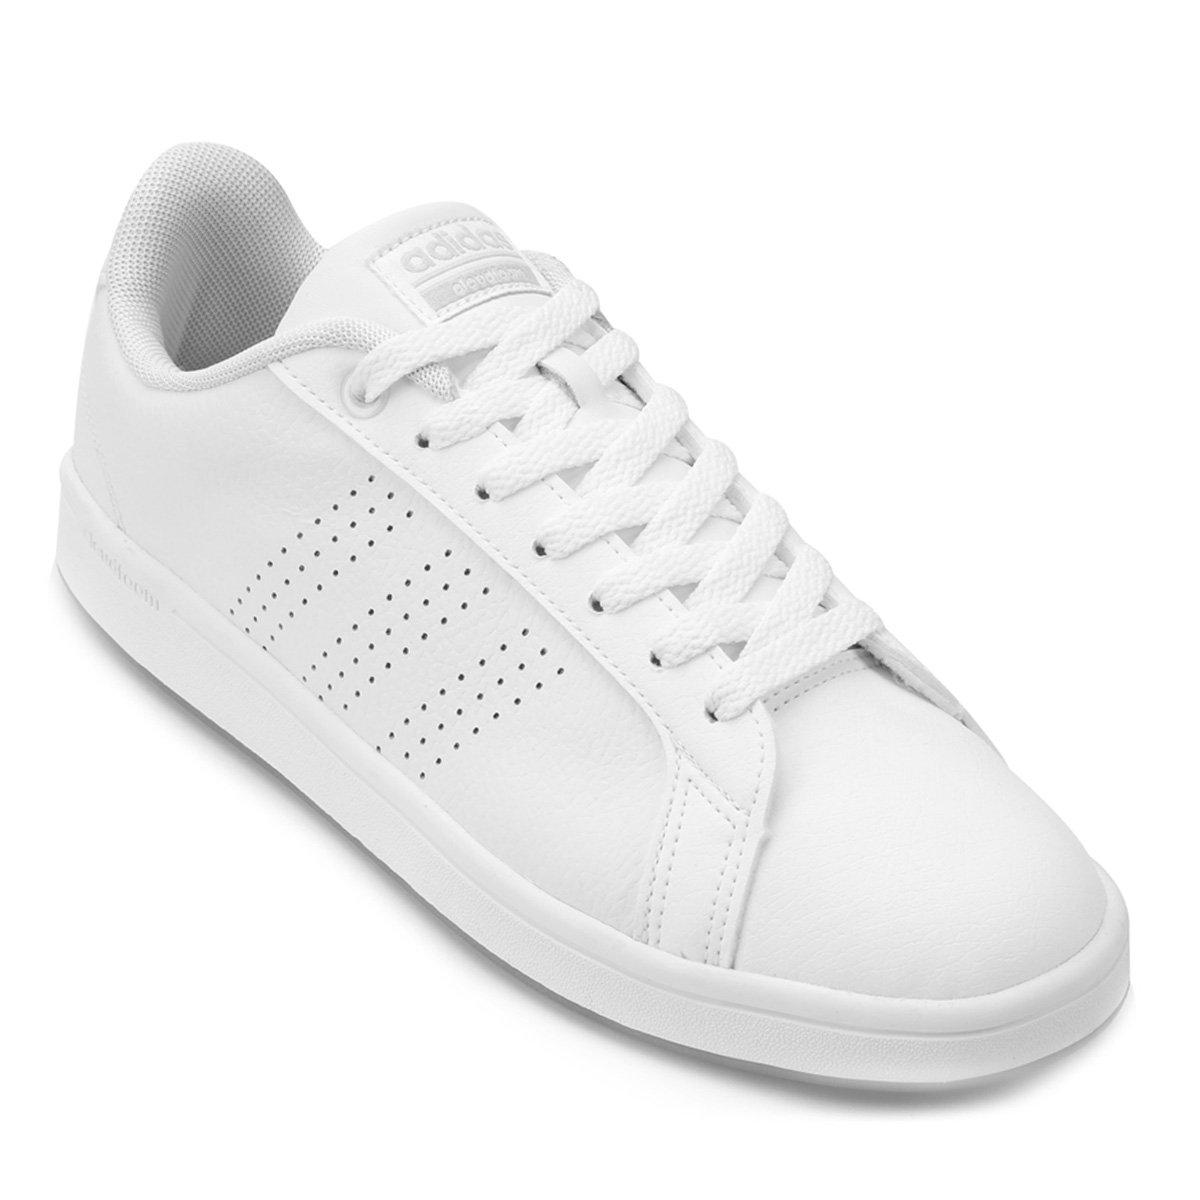 Tênis Adidas Cf Advantage Clean Feminino - Branco